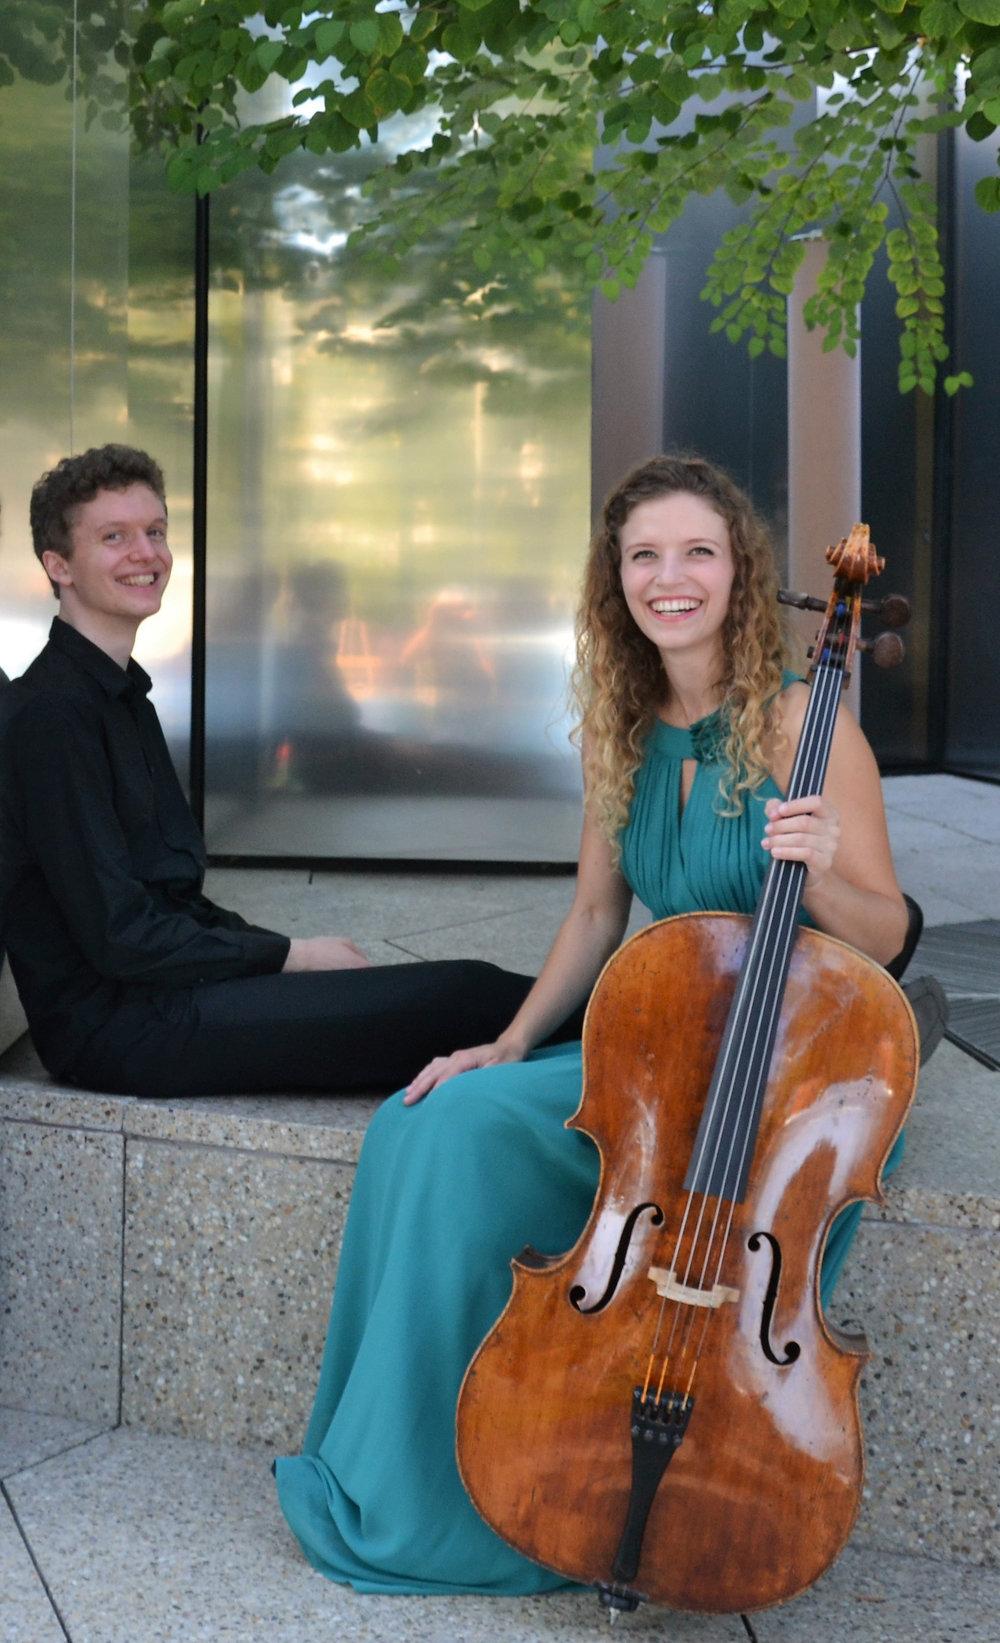 Photo | (c) Marilies and Nikolaus Guschlbauer